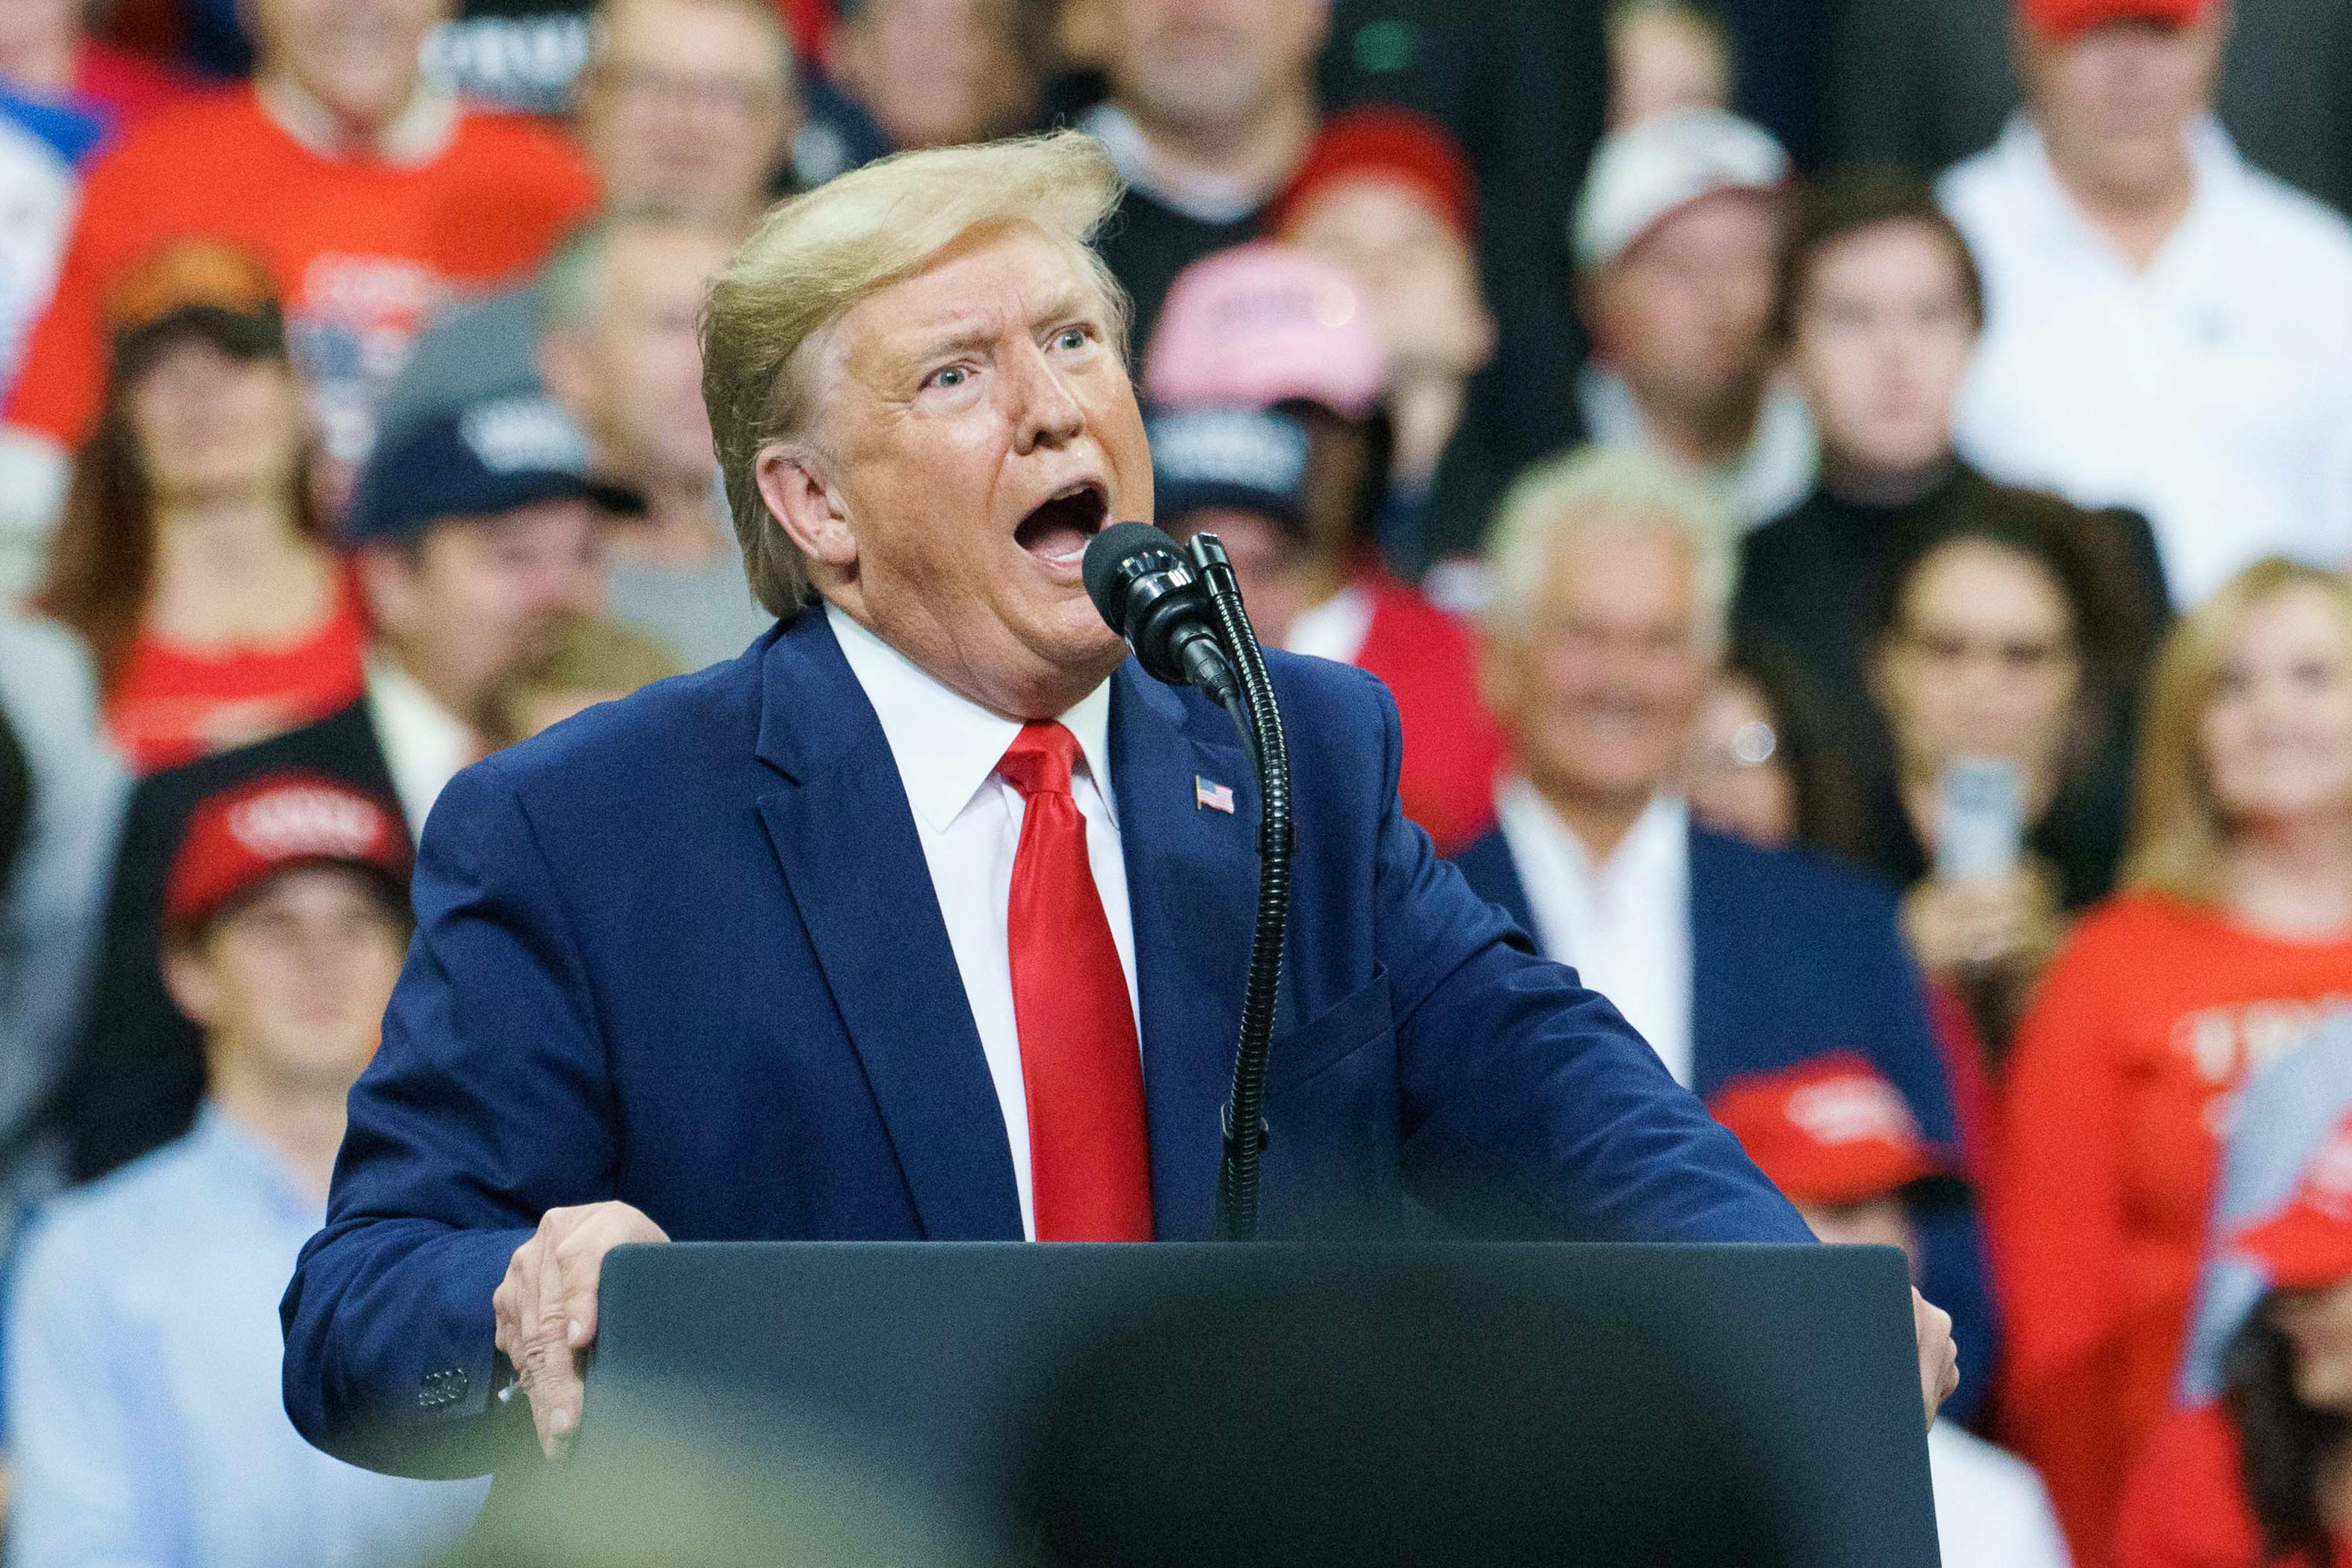 U.S. President Donald Trump speaks during a rally in Minneapolis, Minnesota on Oct. 10, 2019.